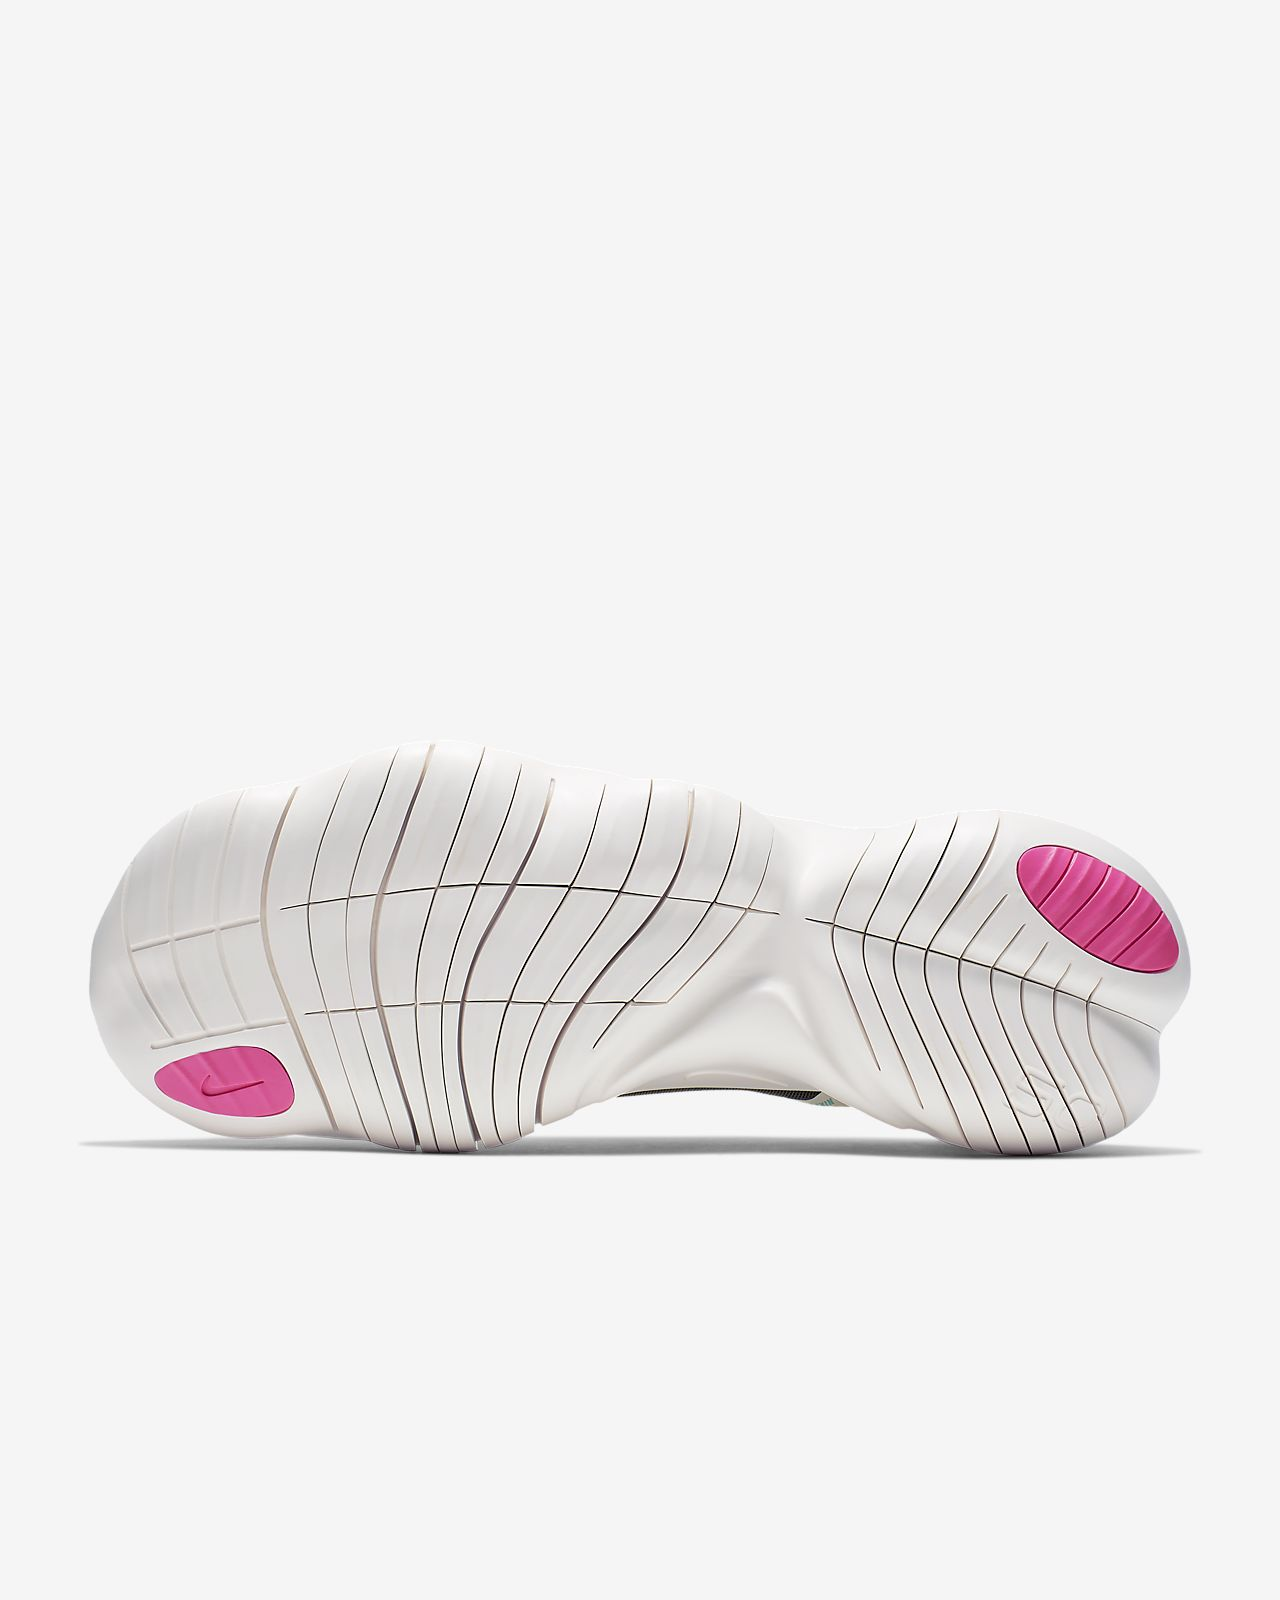 sale retailer 53222 696e2 Nike Free RN 5.0